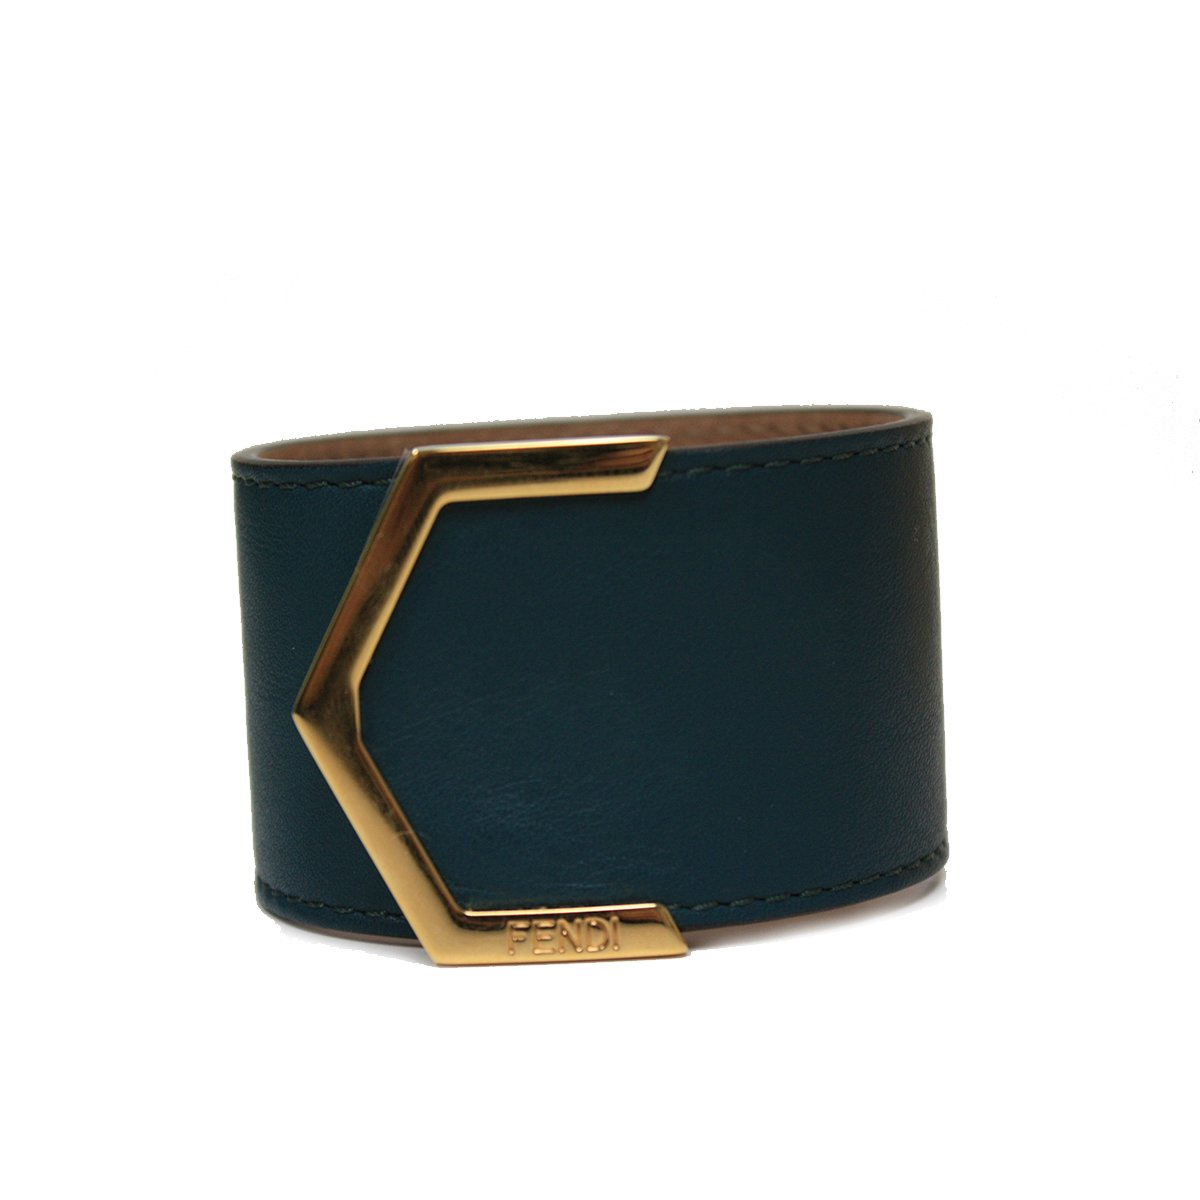 Fendi Leather Dark Teal Cuff Bracelet 240015 by Fendi